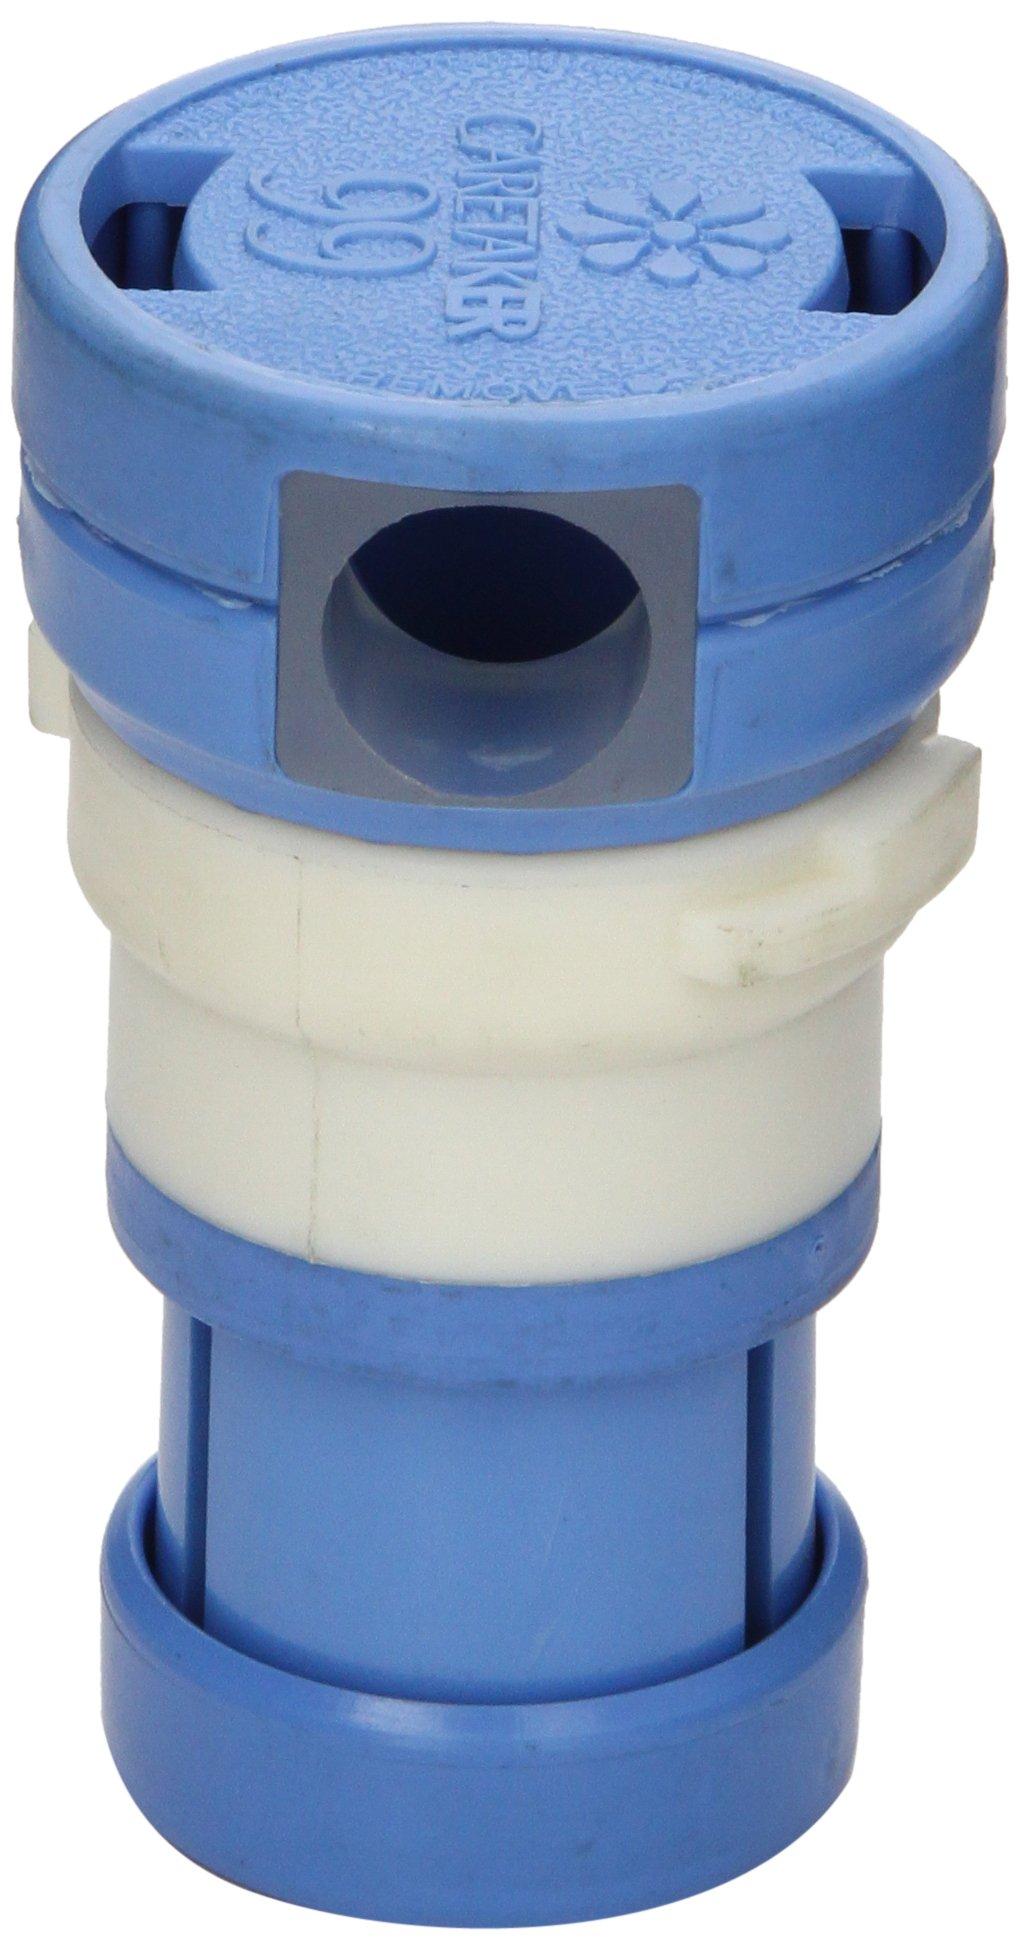 Zodiac 4-9-576 Light Blue Vinyl Liner High Flow Cleaning Head Replacement